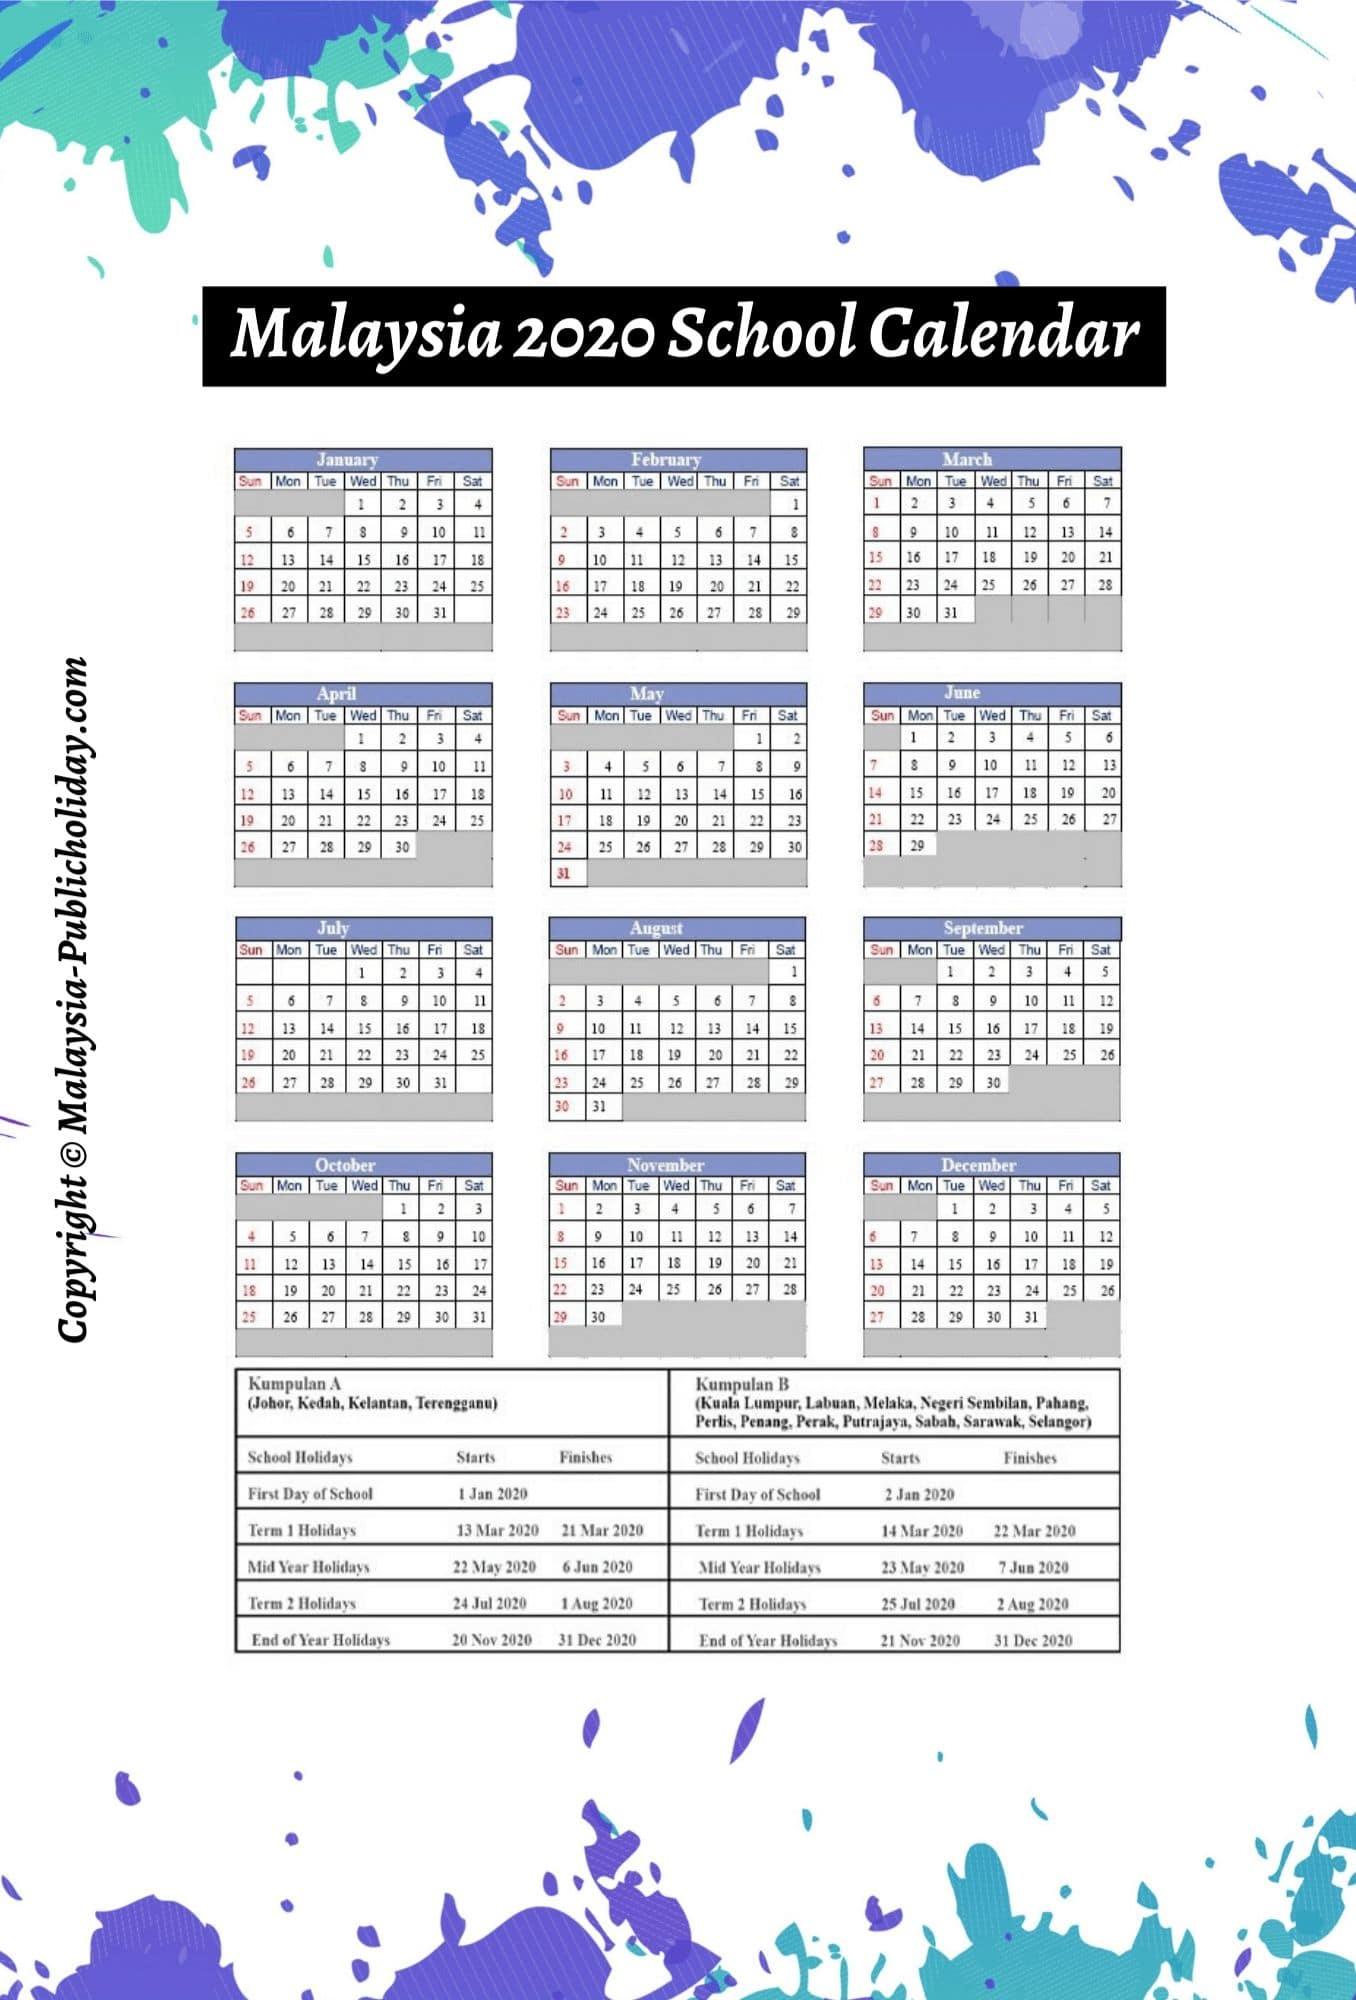 School Holidays 2020 Malaysia